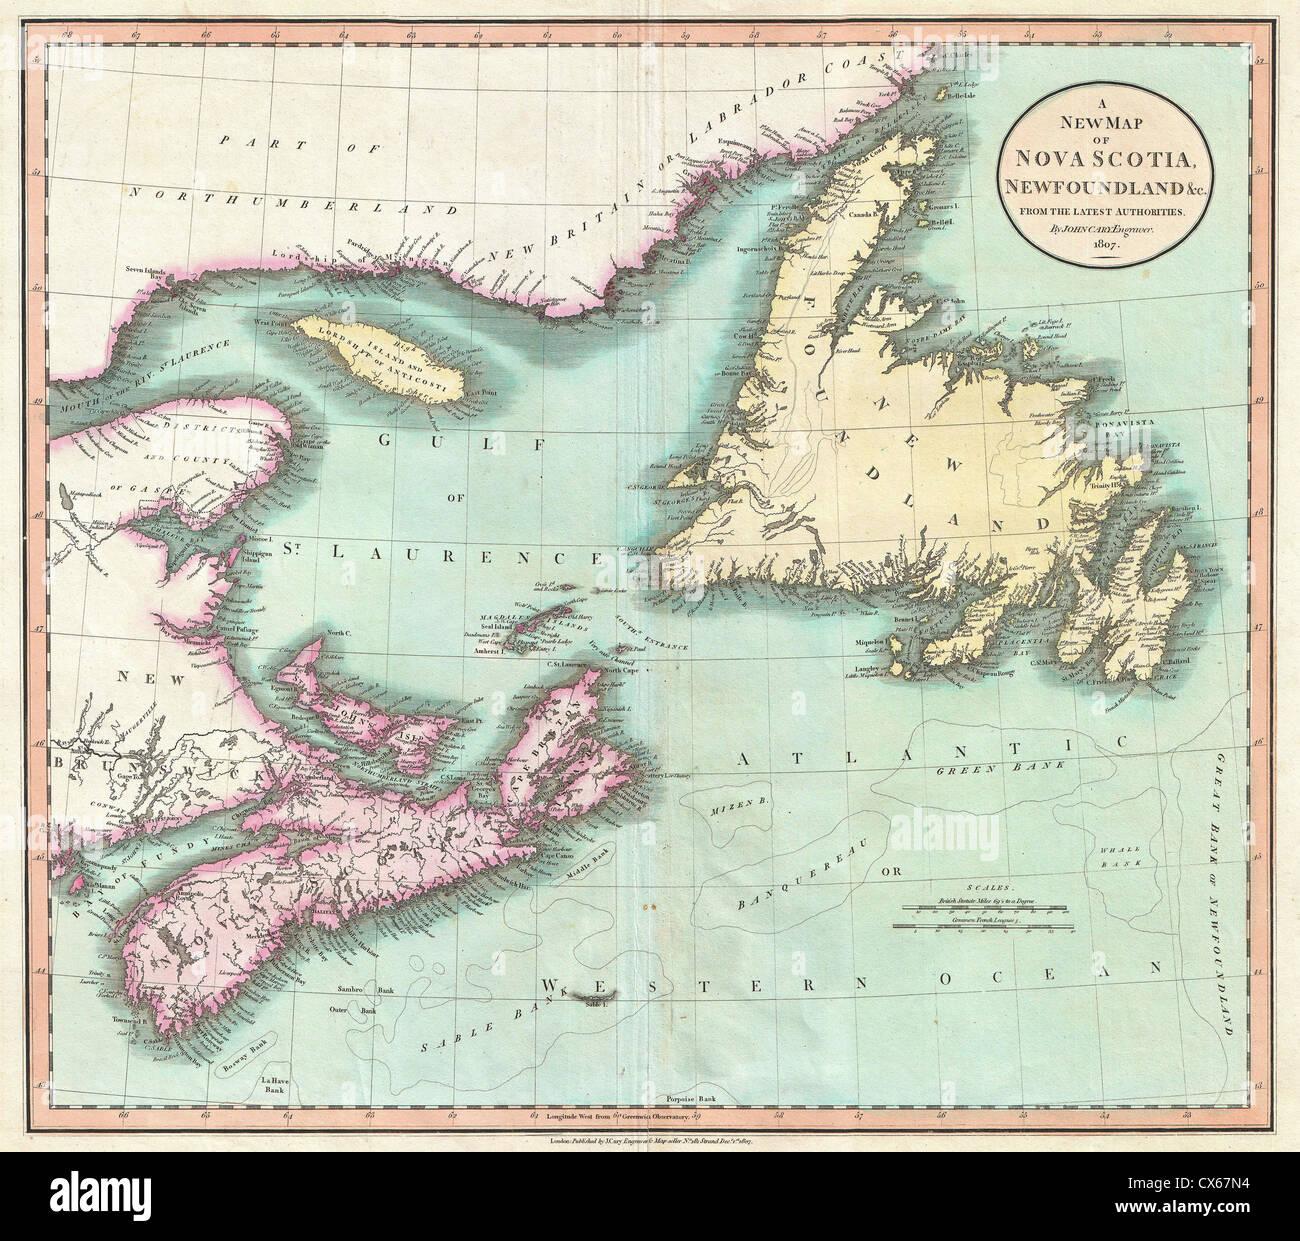 Newfoundland Map on canada map, laurentian mountains map, nova scotia map, alberta map, new brunswick map, yucatan peninsula map, quebec map, europe map, hispaniola map, hudson bay map, iceland map, manitoba map, bahamas map, avalon peninsula map, new mexico map, british columbia map, north america map, world map, labrador map, greenland map,